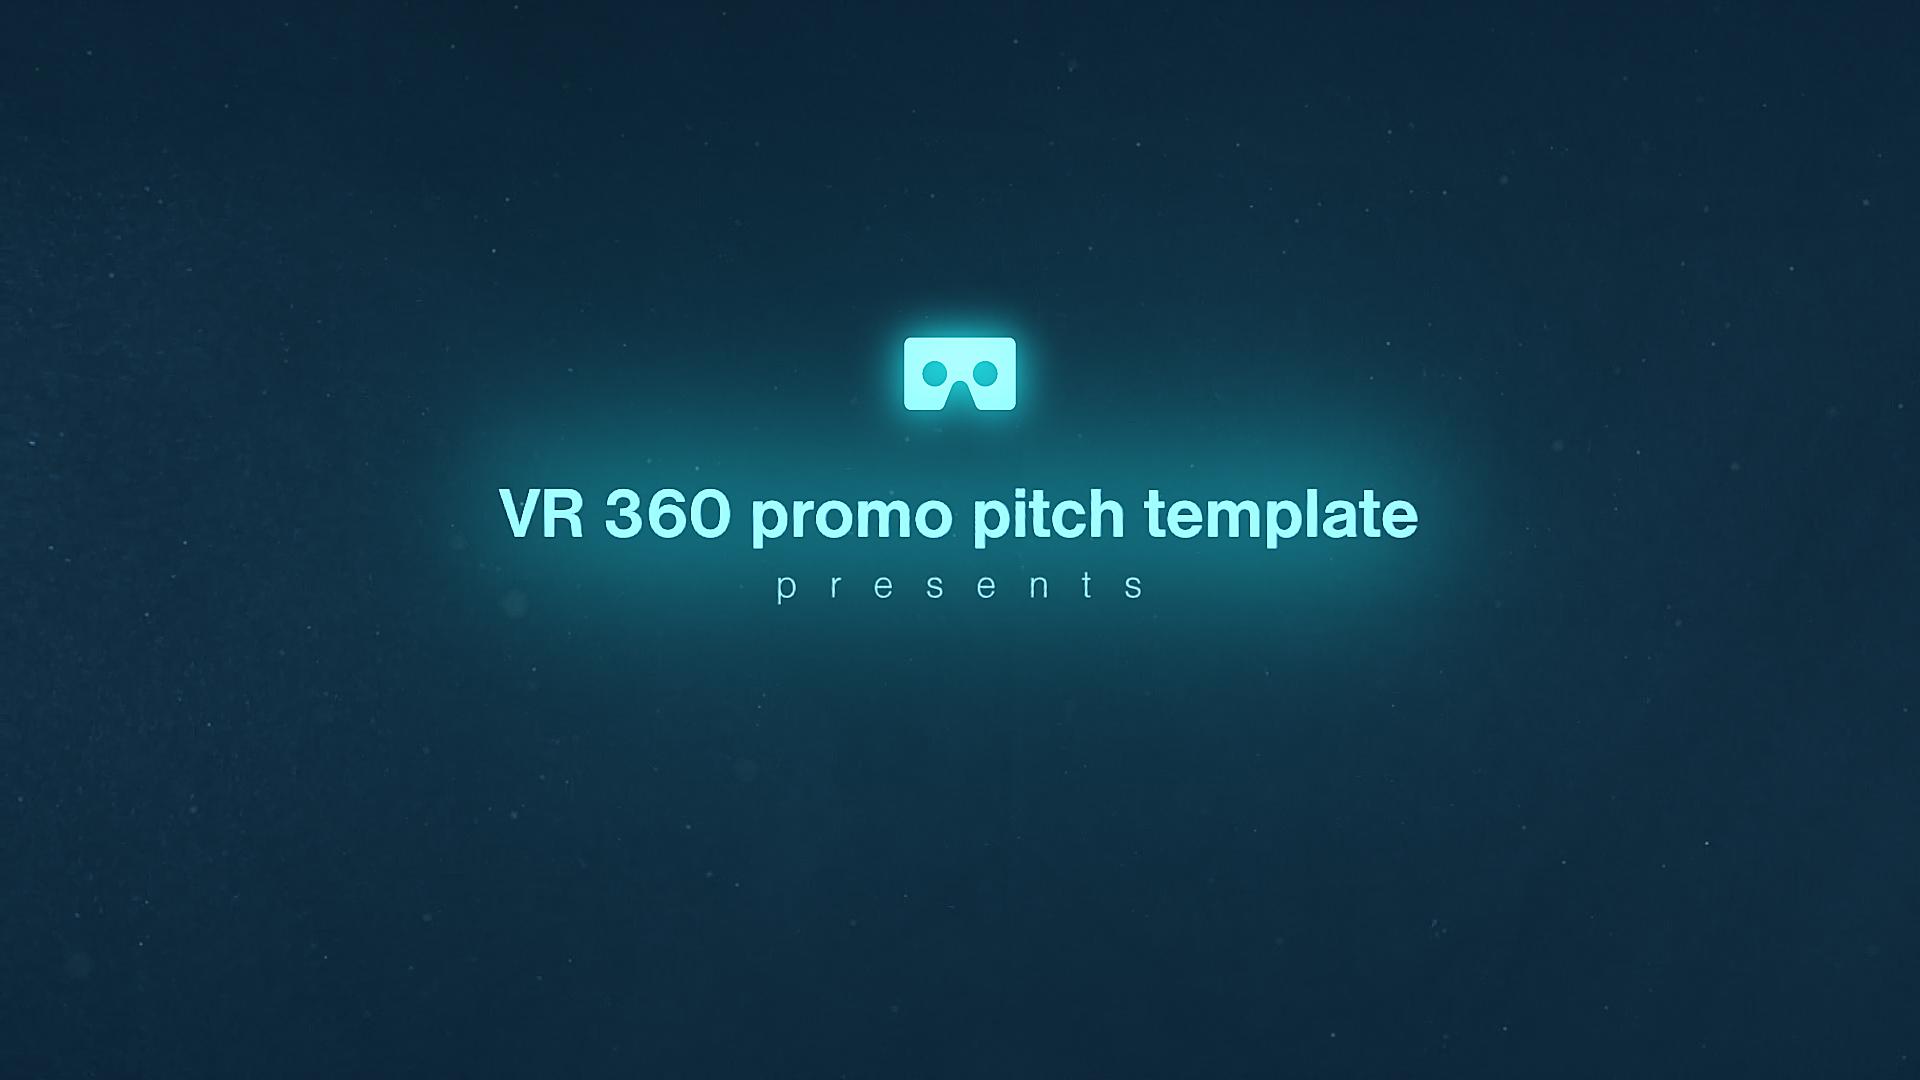 VR_360_Promo_Pitch_1080p_00201